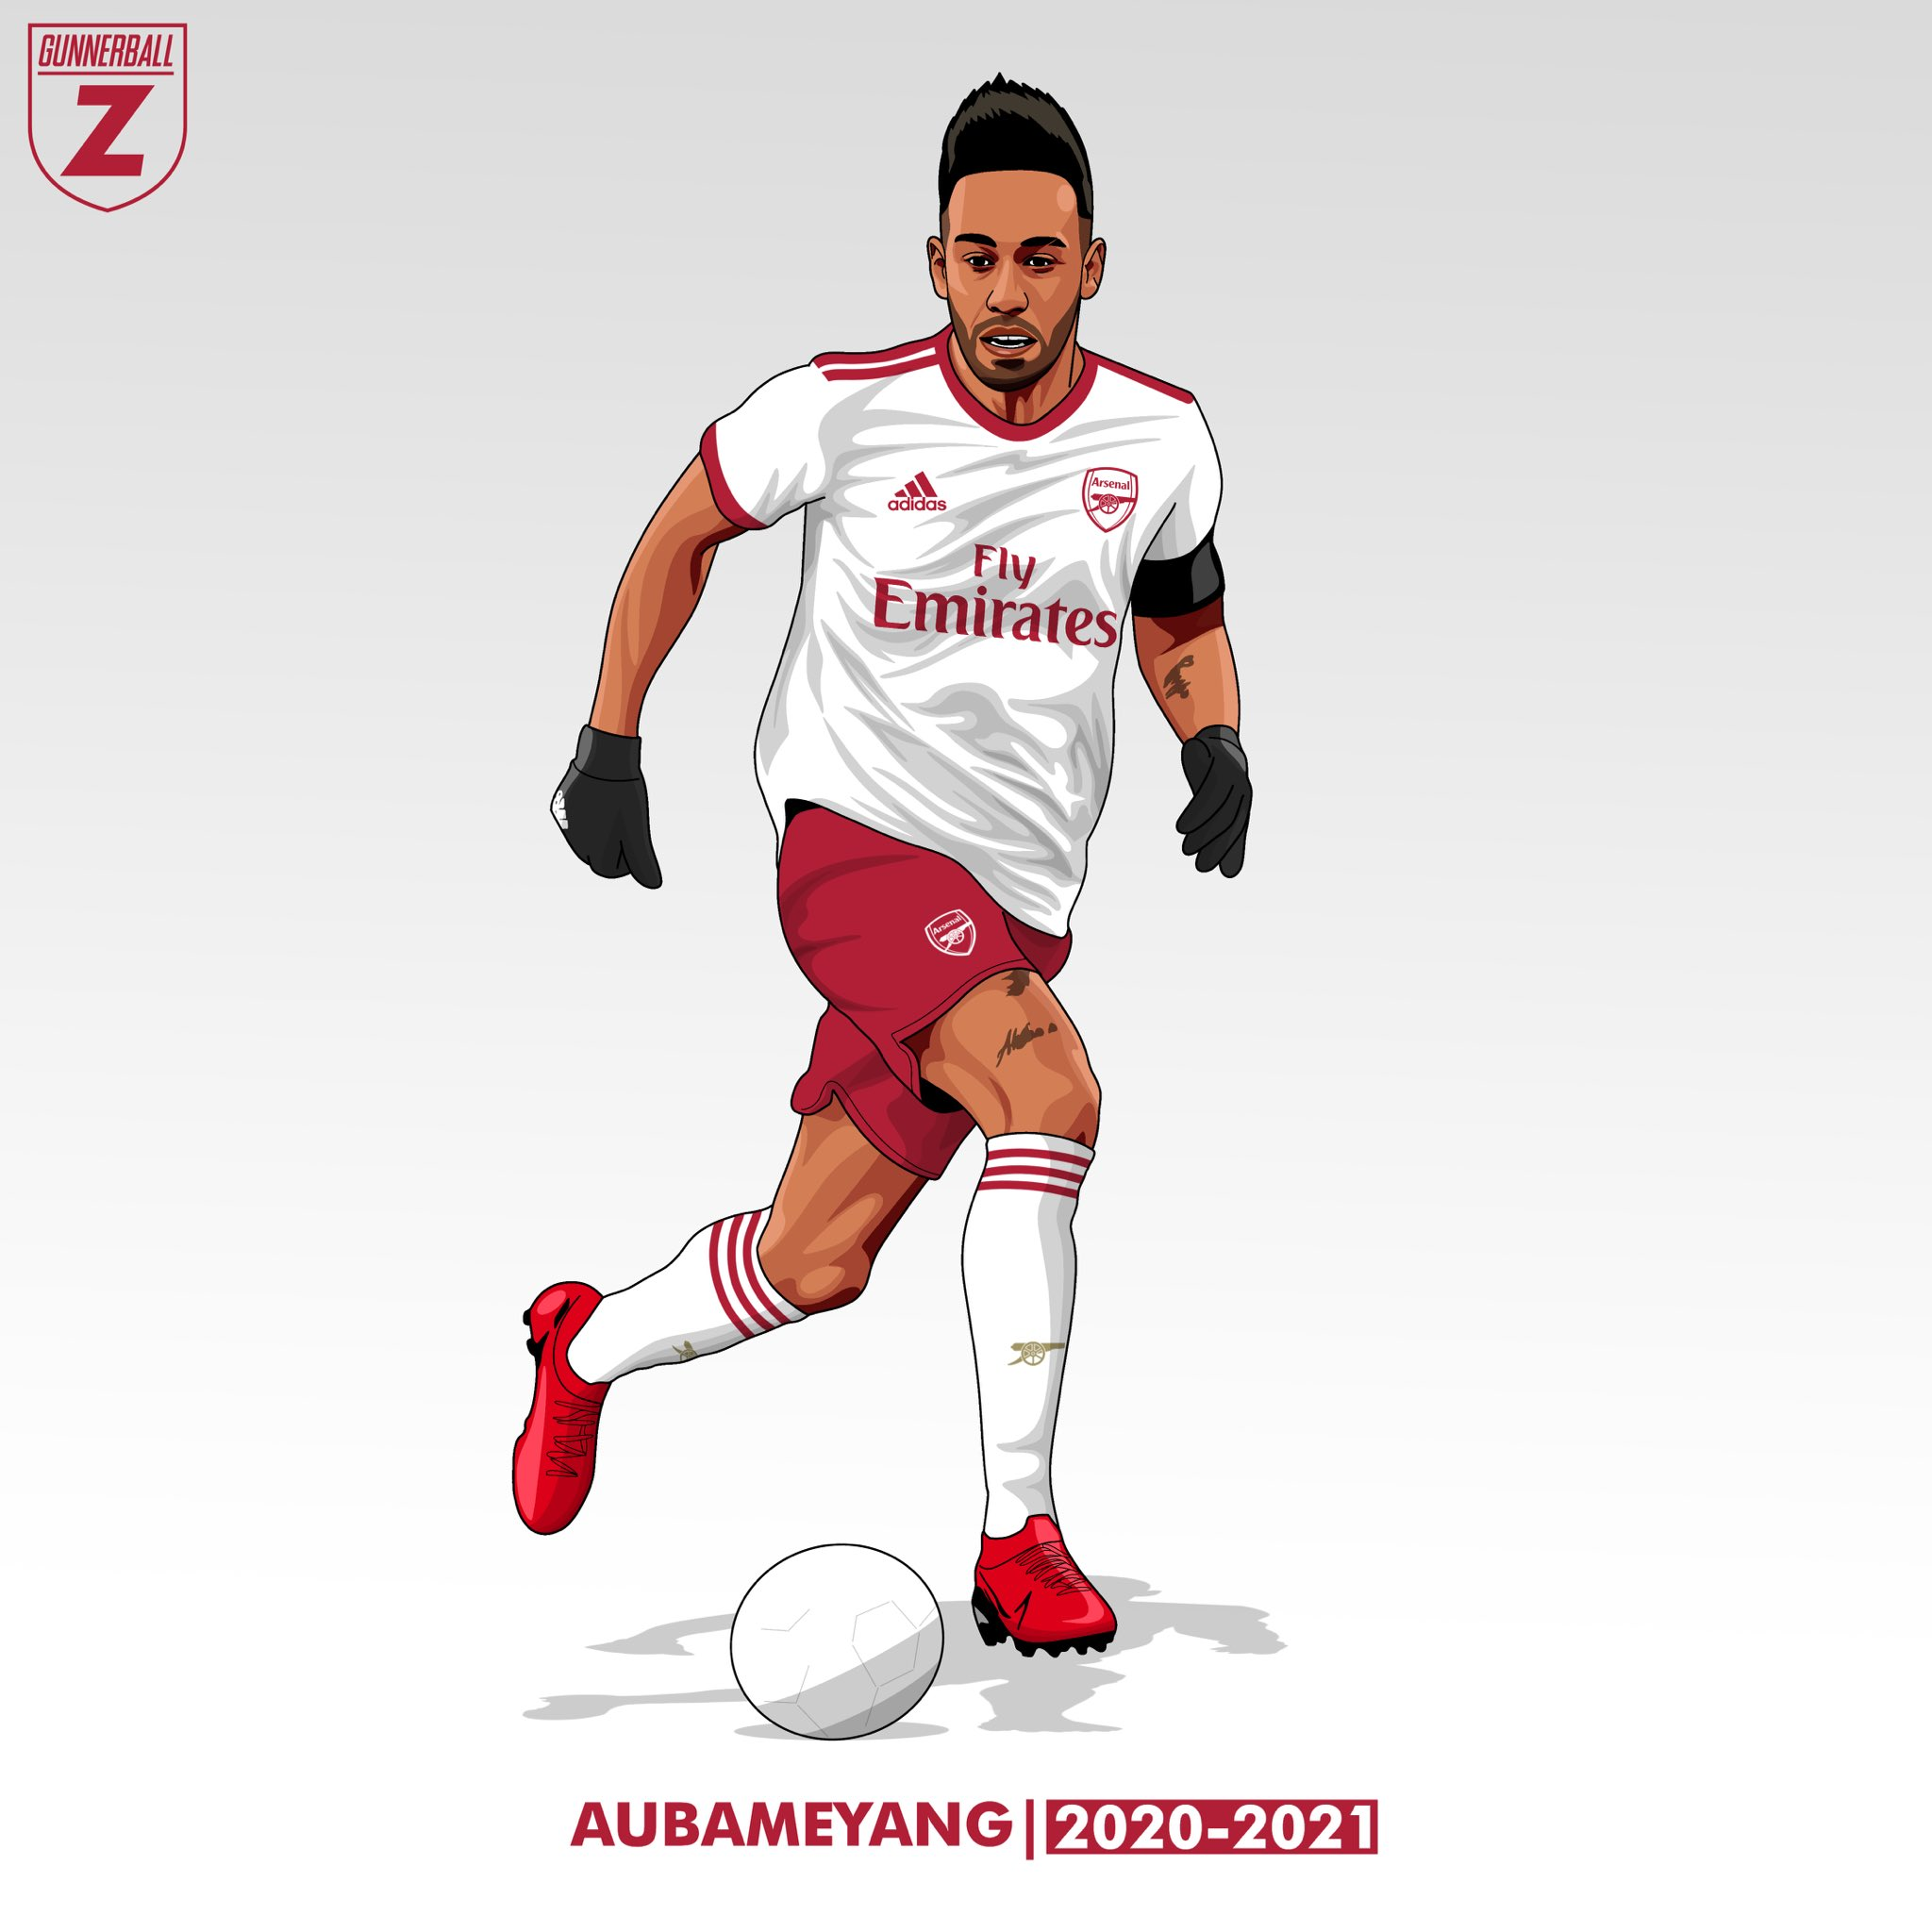 Gunnerballz On Twitter Aubameyang 2020 2021 Away Kit It Really Helps Me Out Arsenal Adidas Aubameyang Arsenalkit